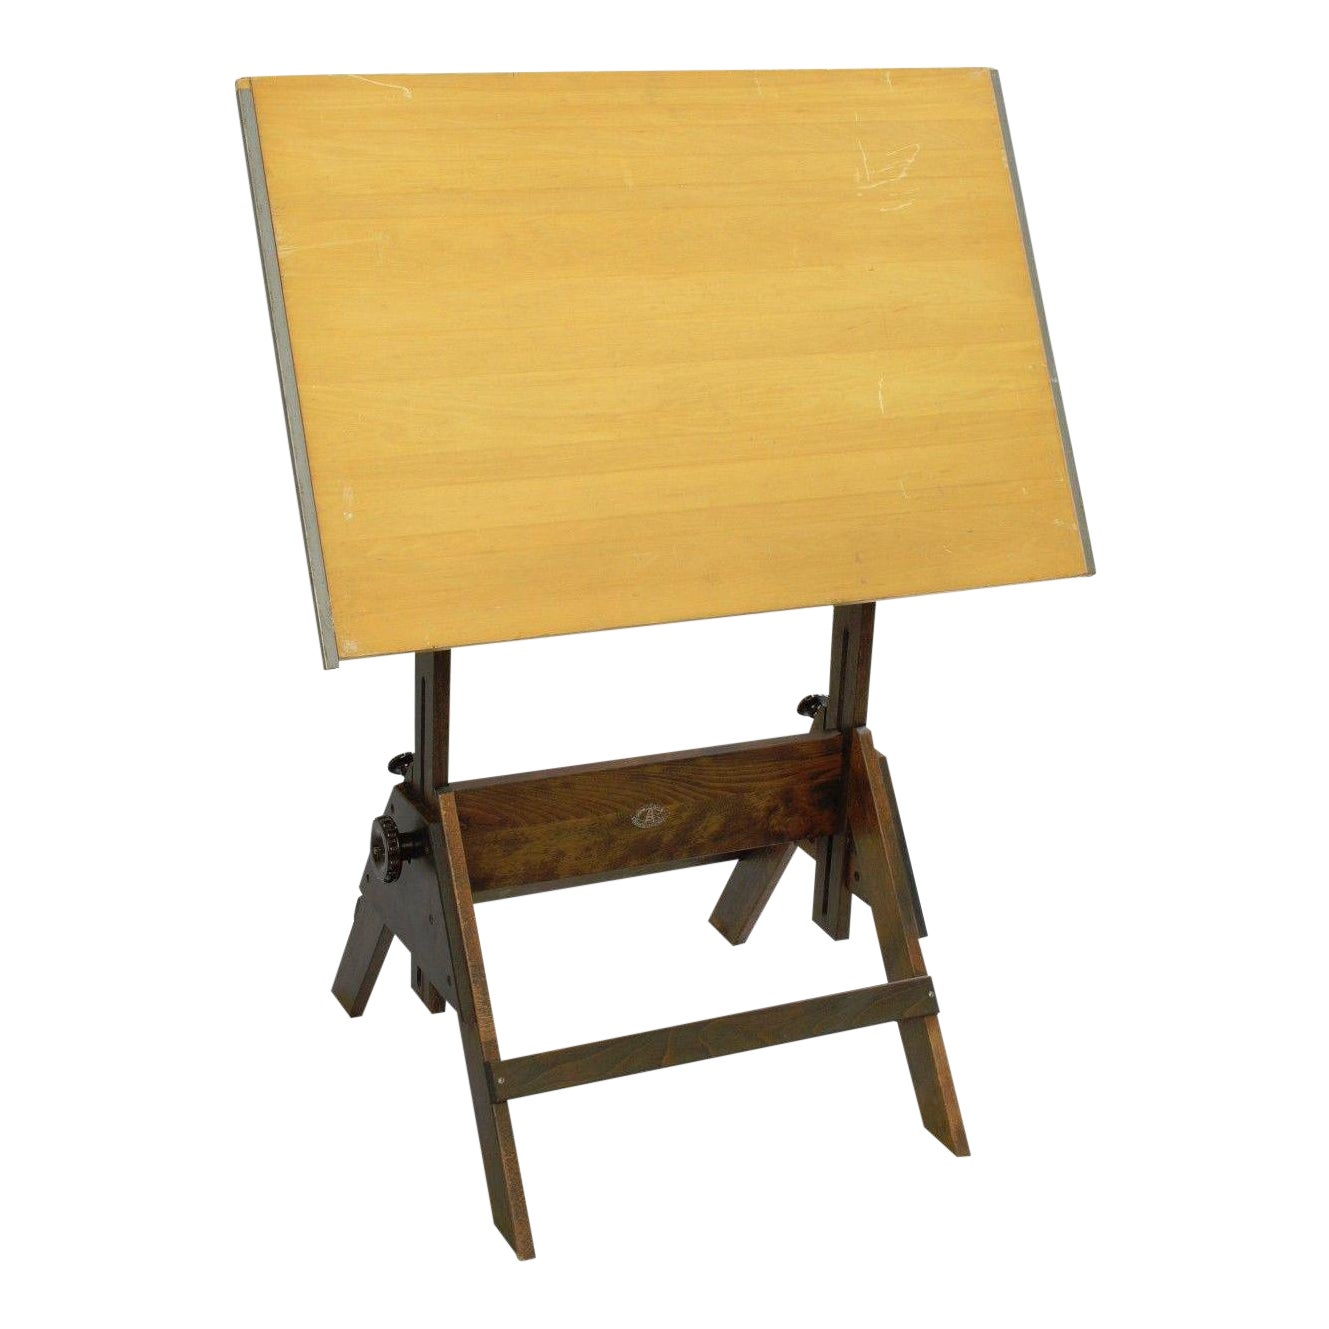 Vintage Anco-Bilt Wooden Adjustable Drafting Table Architect Artist ...